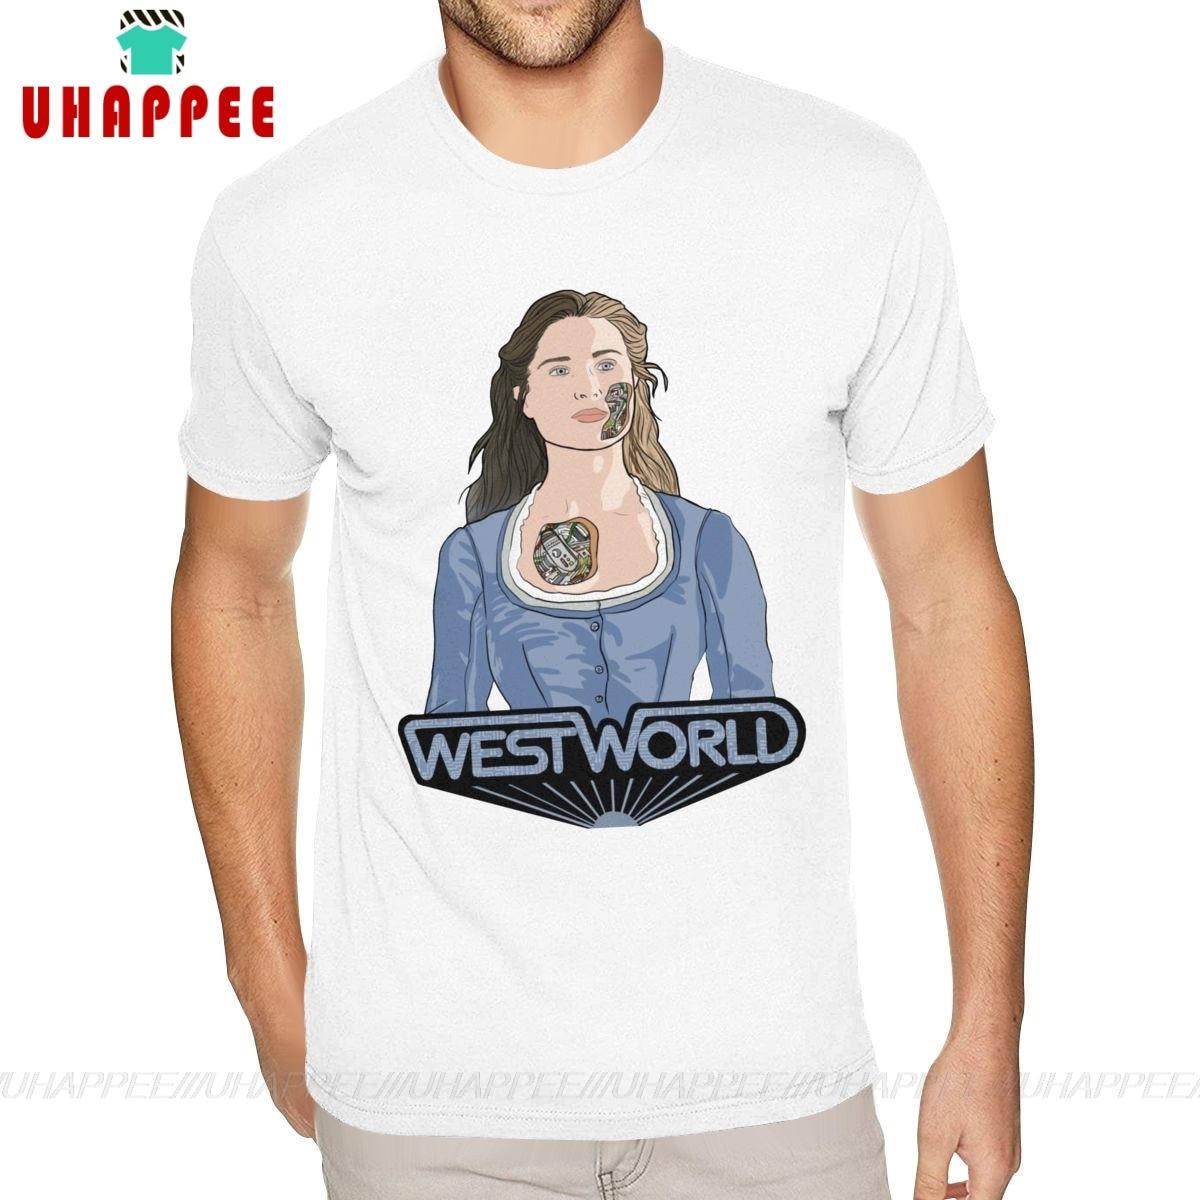 Westworld Dolores Abernathy футболки 5XL мужские чистые рубашки